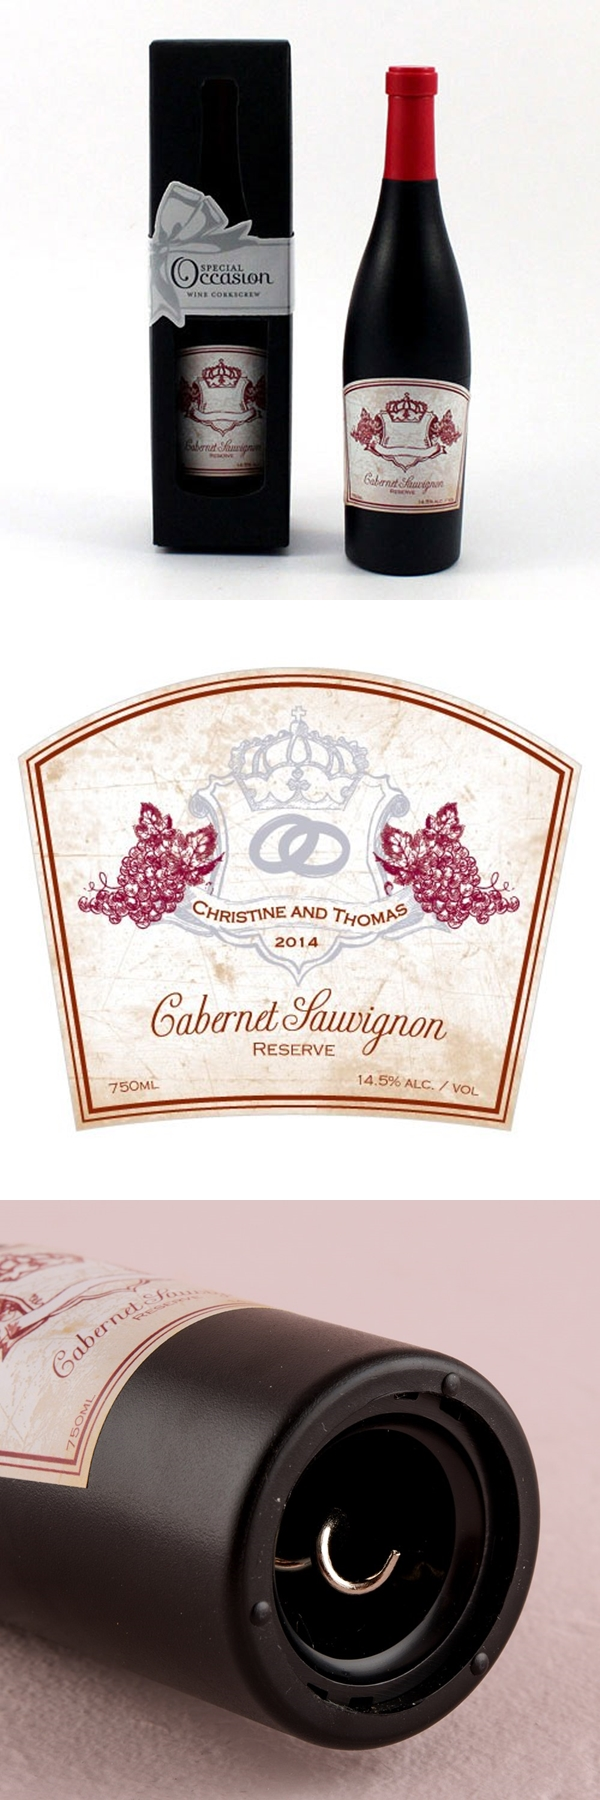 Weddingstar Wine Bottle-Shaped Corkscrew with Aged Vineyard Label